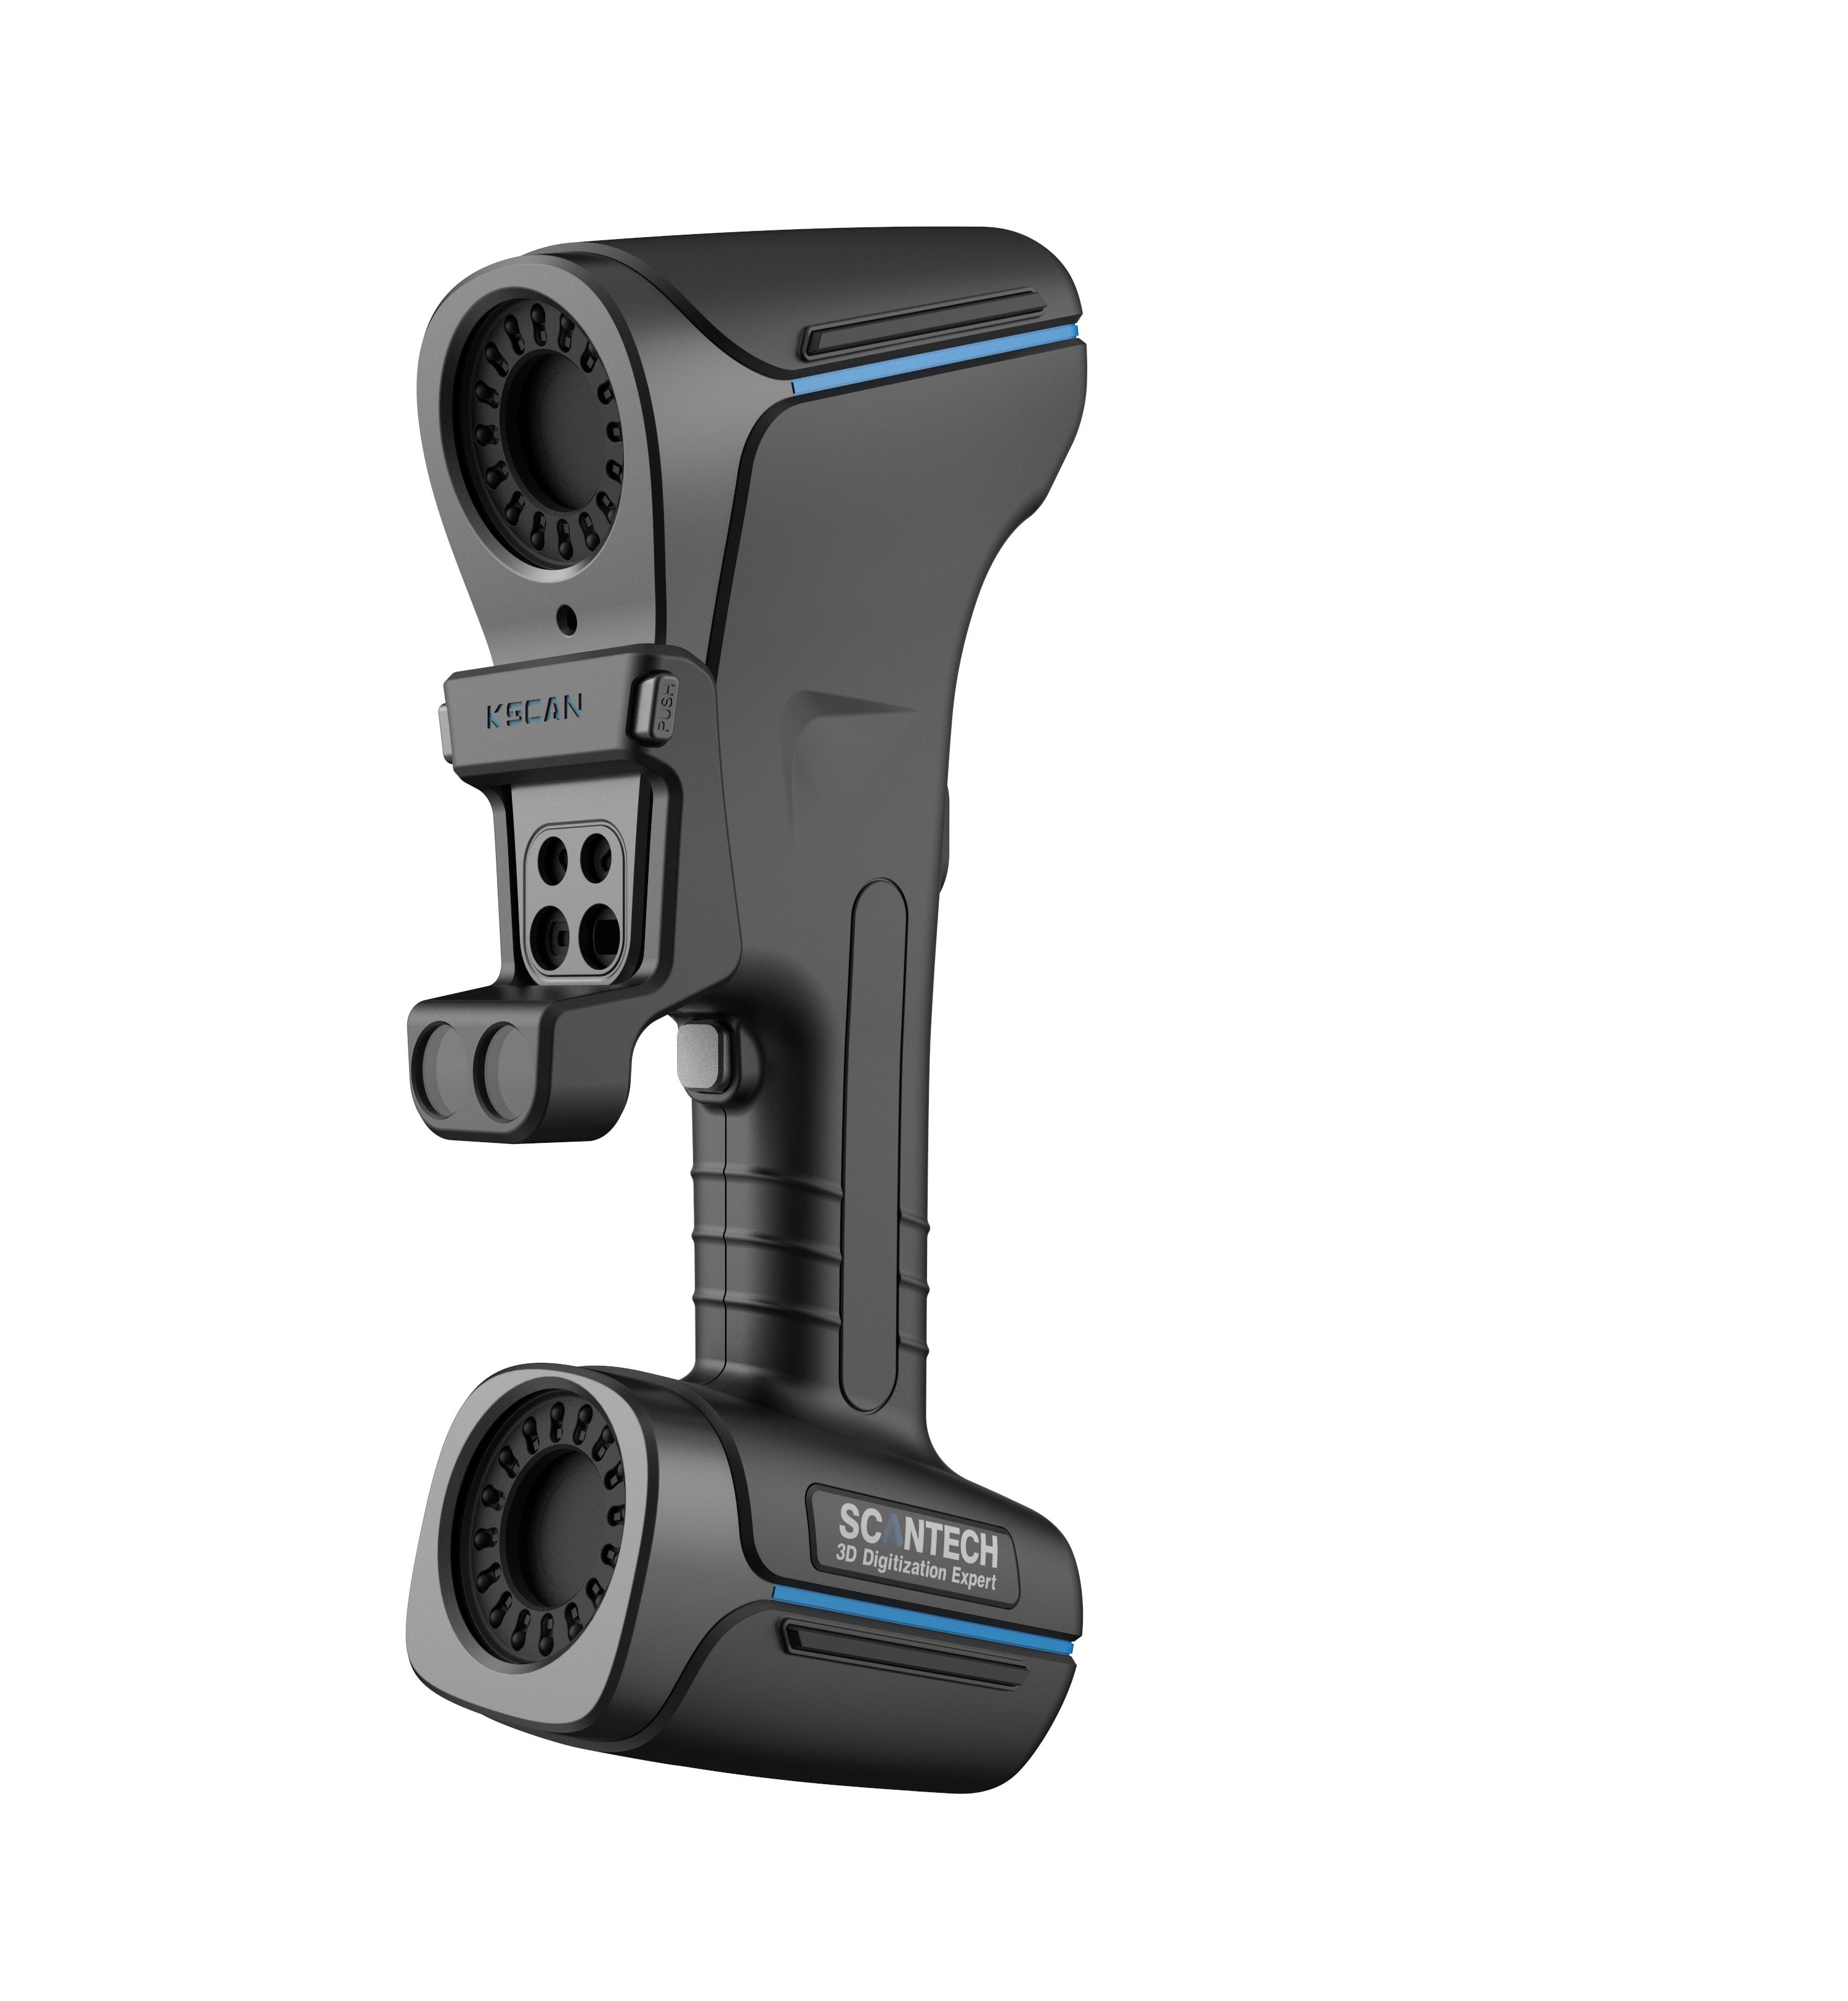 KSCAN20 Handheld 3D Scanner